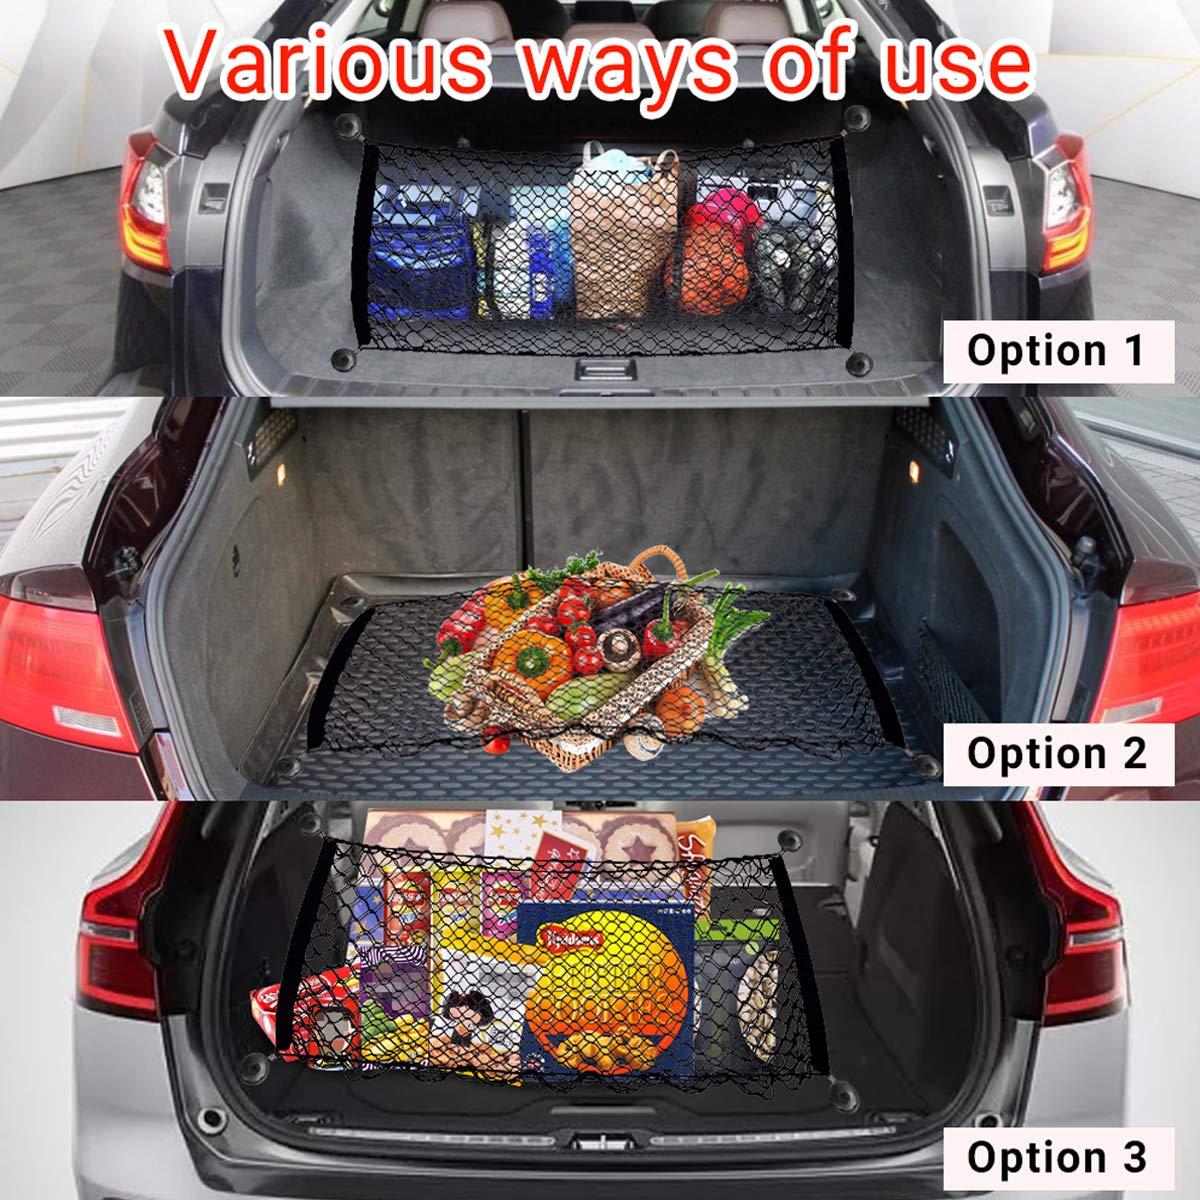 Luoistu Car Cargo Net 50 x 130CM Double Nylon Rear Car Cargo Organizer Net with 4 Hook for SUV Black Trunk Stretchable Elastic Trunk Storage Net Pickup,Truck Bed